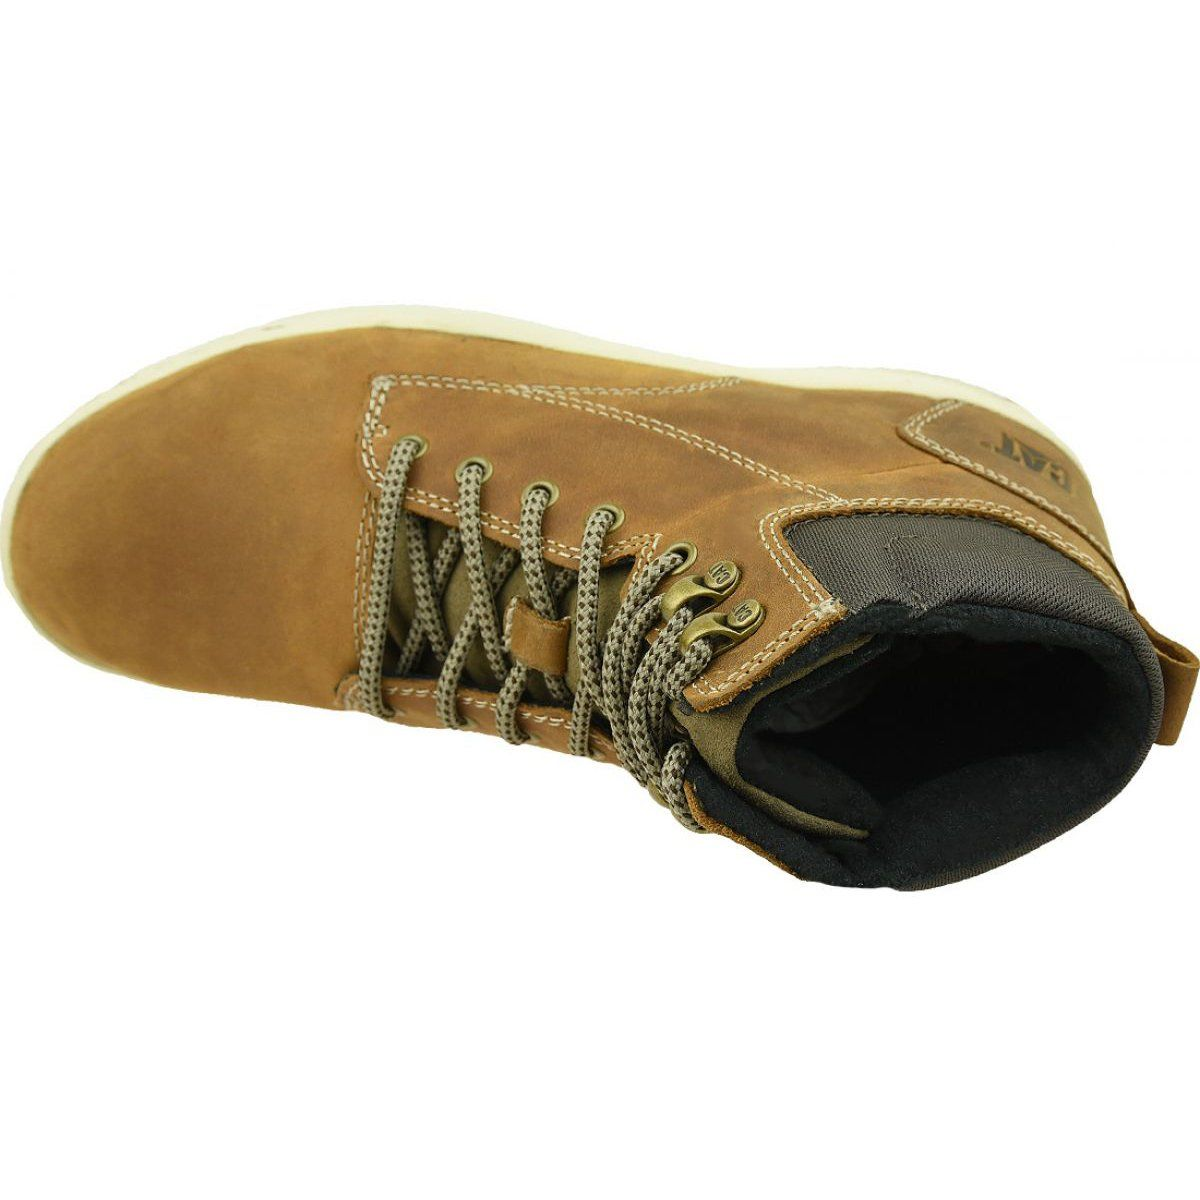 Buty Caterpillar Colfax Mid M P716680 Brazowe Vibram Sneaker Shoes Sneakers